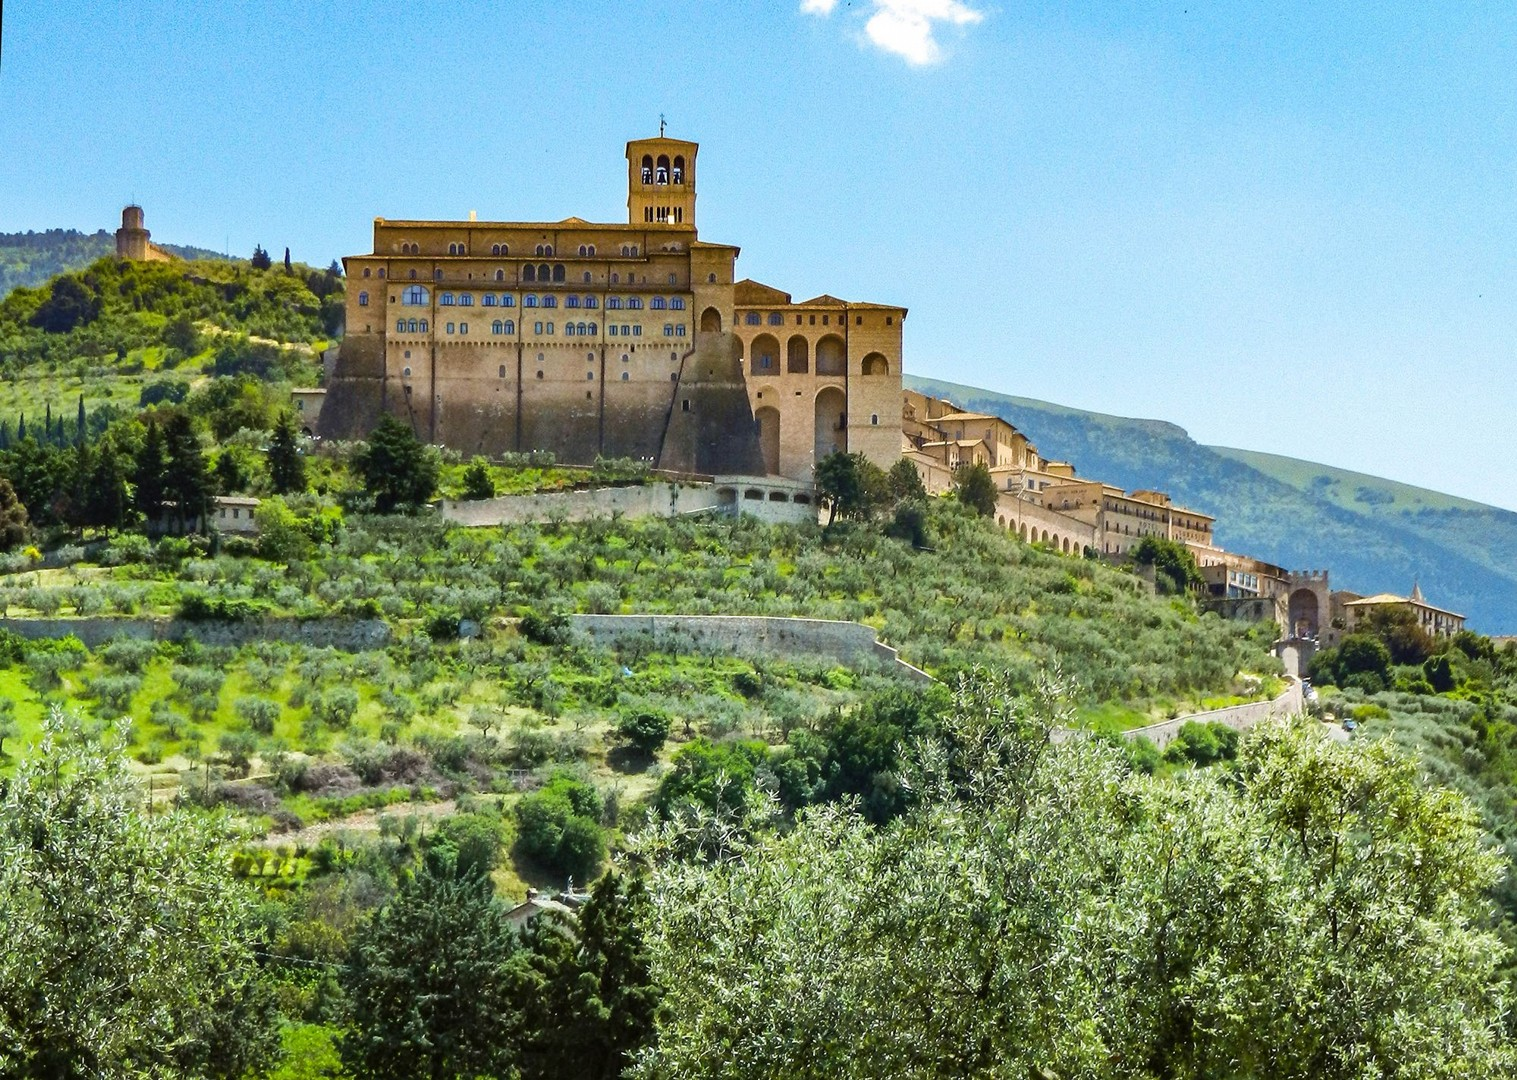 holiday-saddle-skedaddle-road-cycling-trip-guided.jpg - NEW! Italy - Coast to Coast - L'Adriatico al Tirreno - Road Cycling